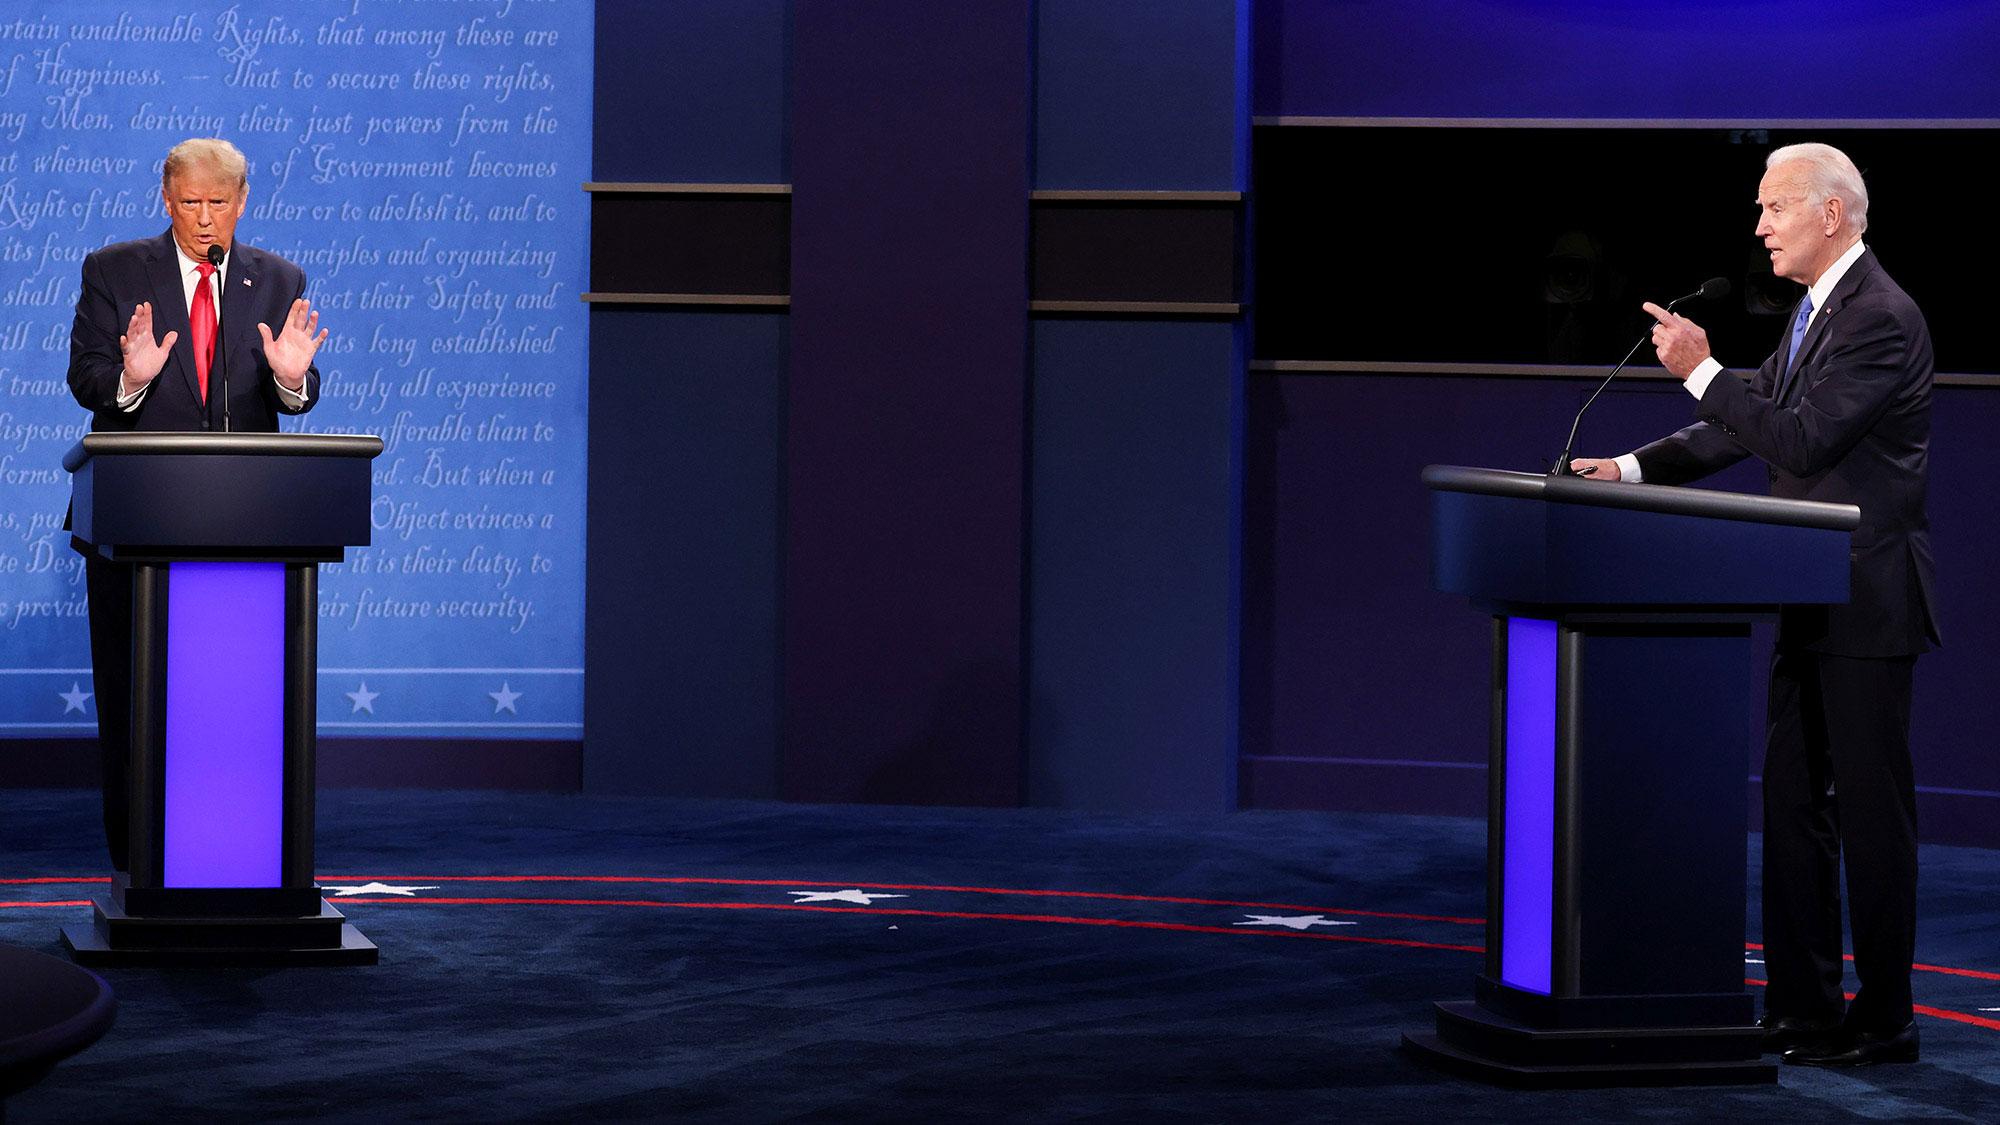 President Donald Trump and Democratic presidential nominee Joe Biden debate in Nashville on October 22.